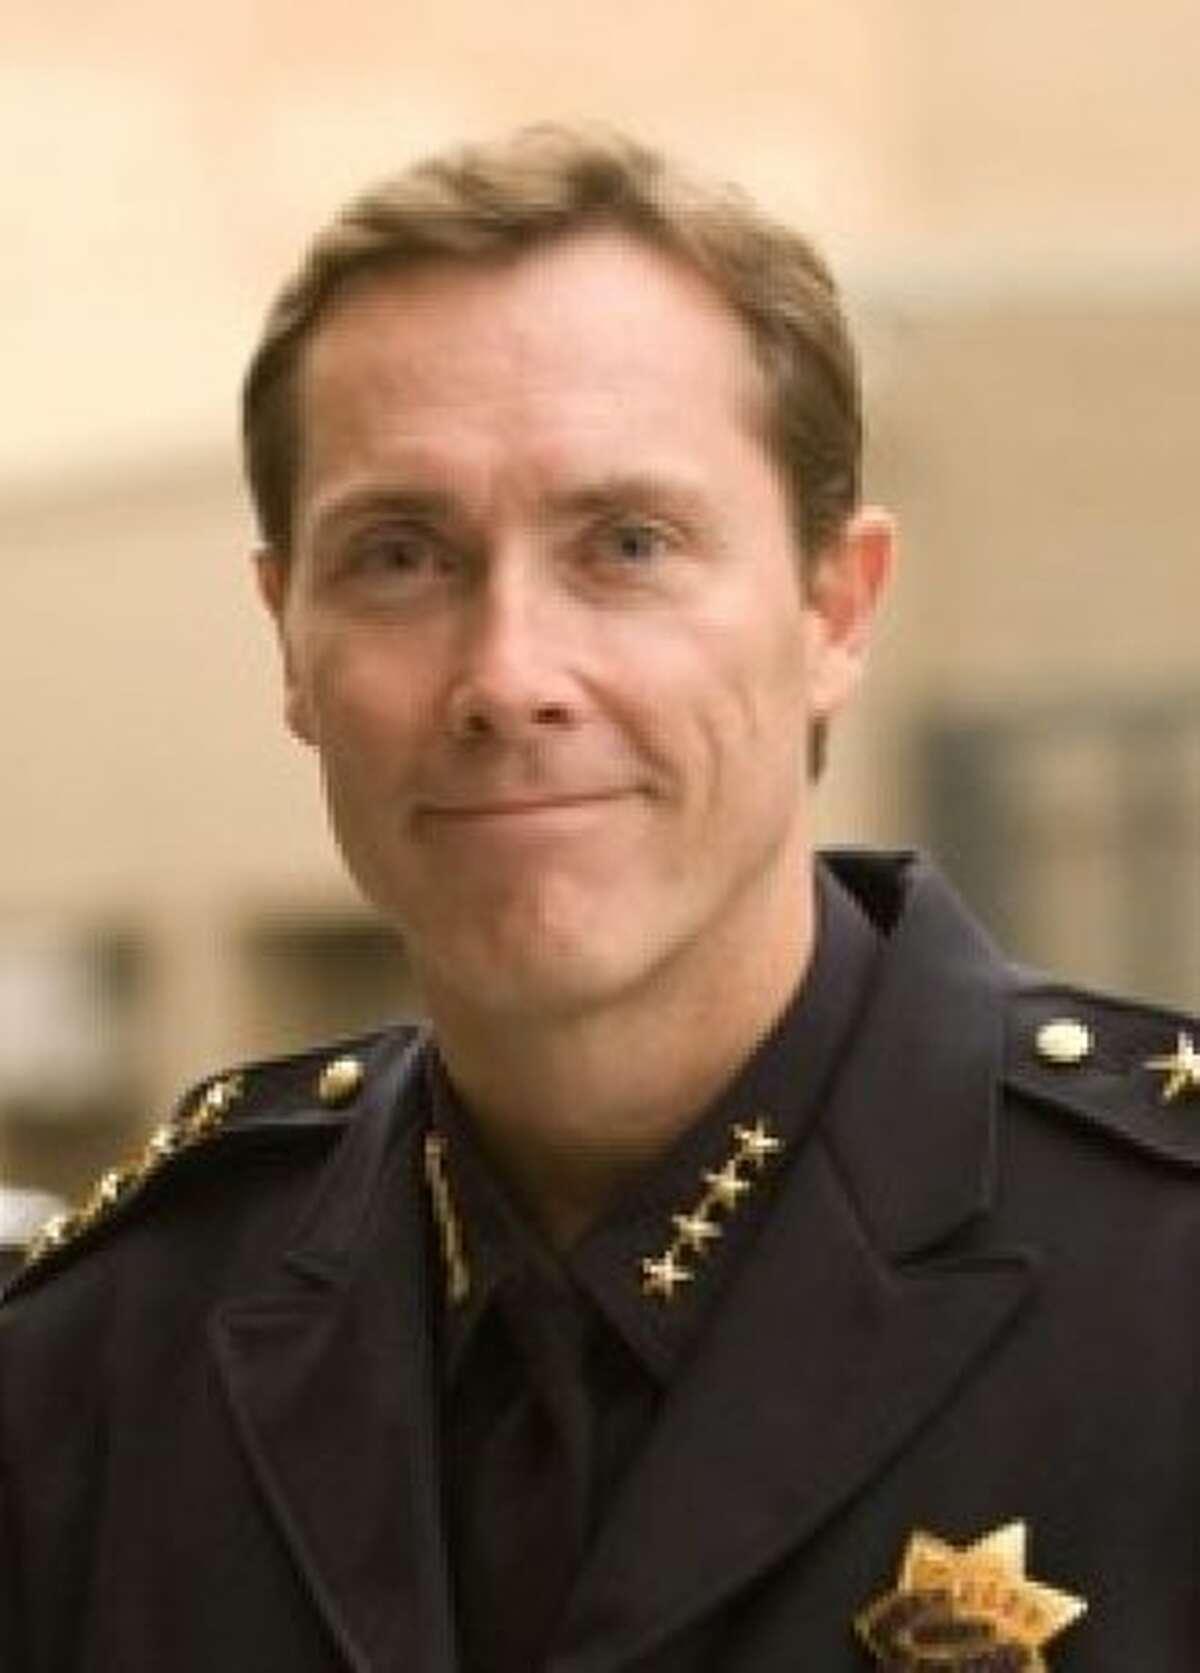 Berkeley Police Chief Michael Meehan